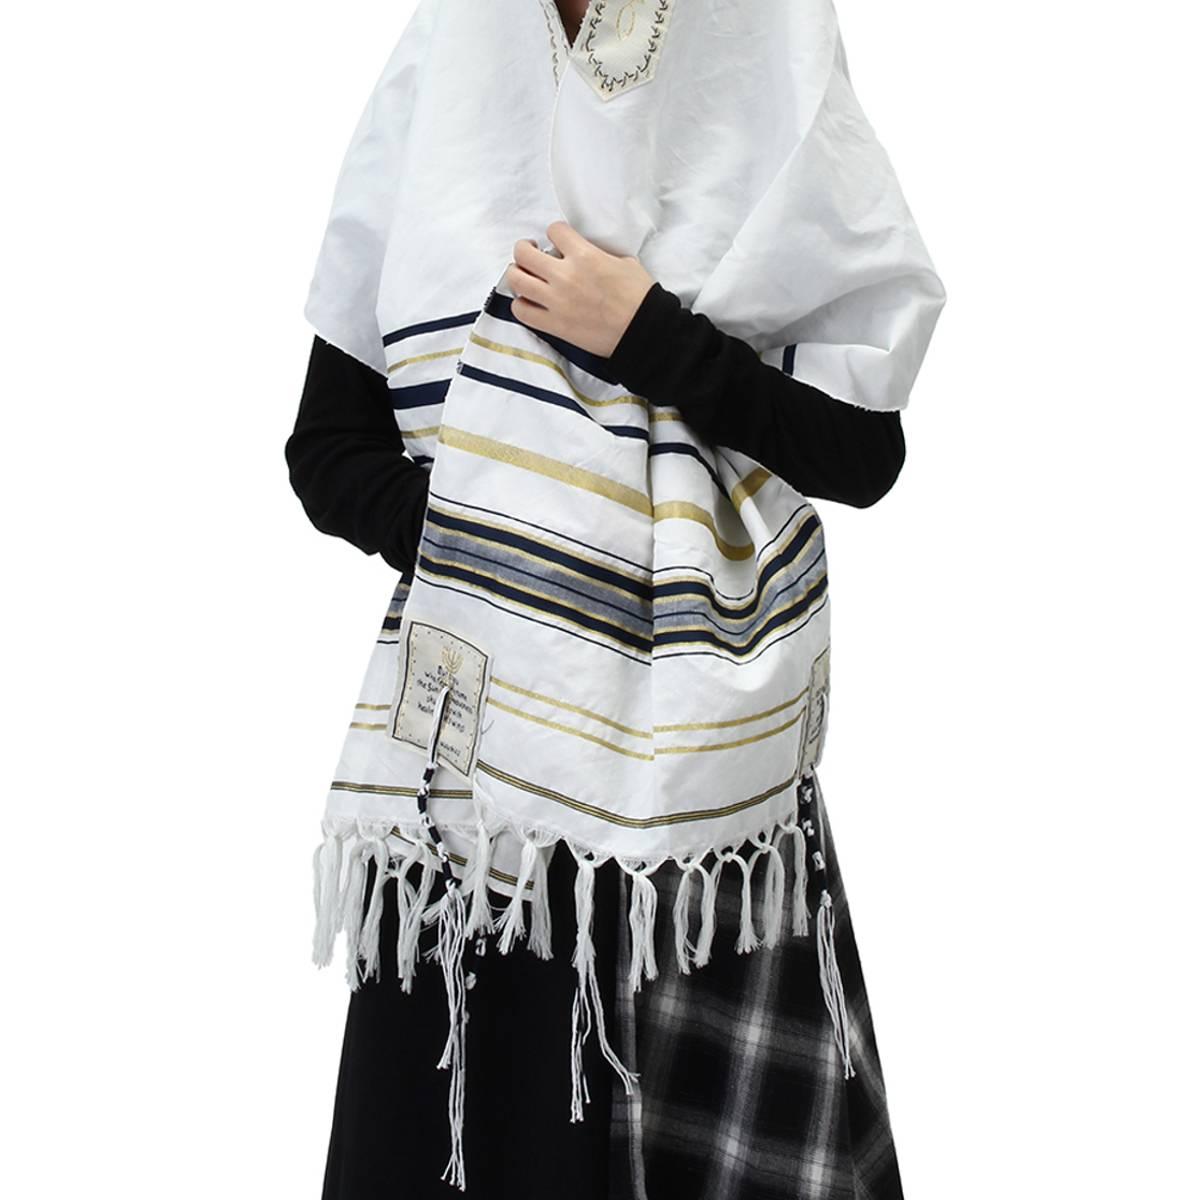 Winter Women Scarf Messianic Jewish Tallit Prayer Shawl Blue And Gold Stripe Prayer Shawl And Talis Bag Prayer Scarfs 175X50CM